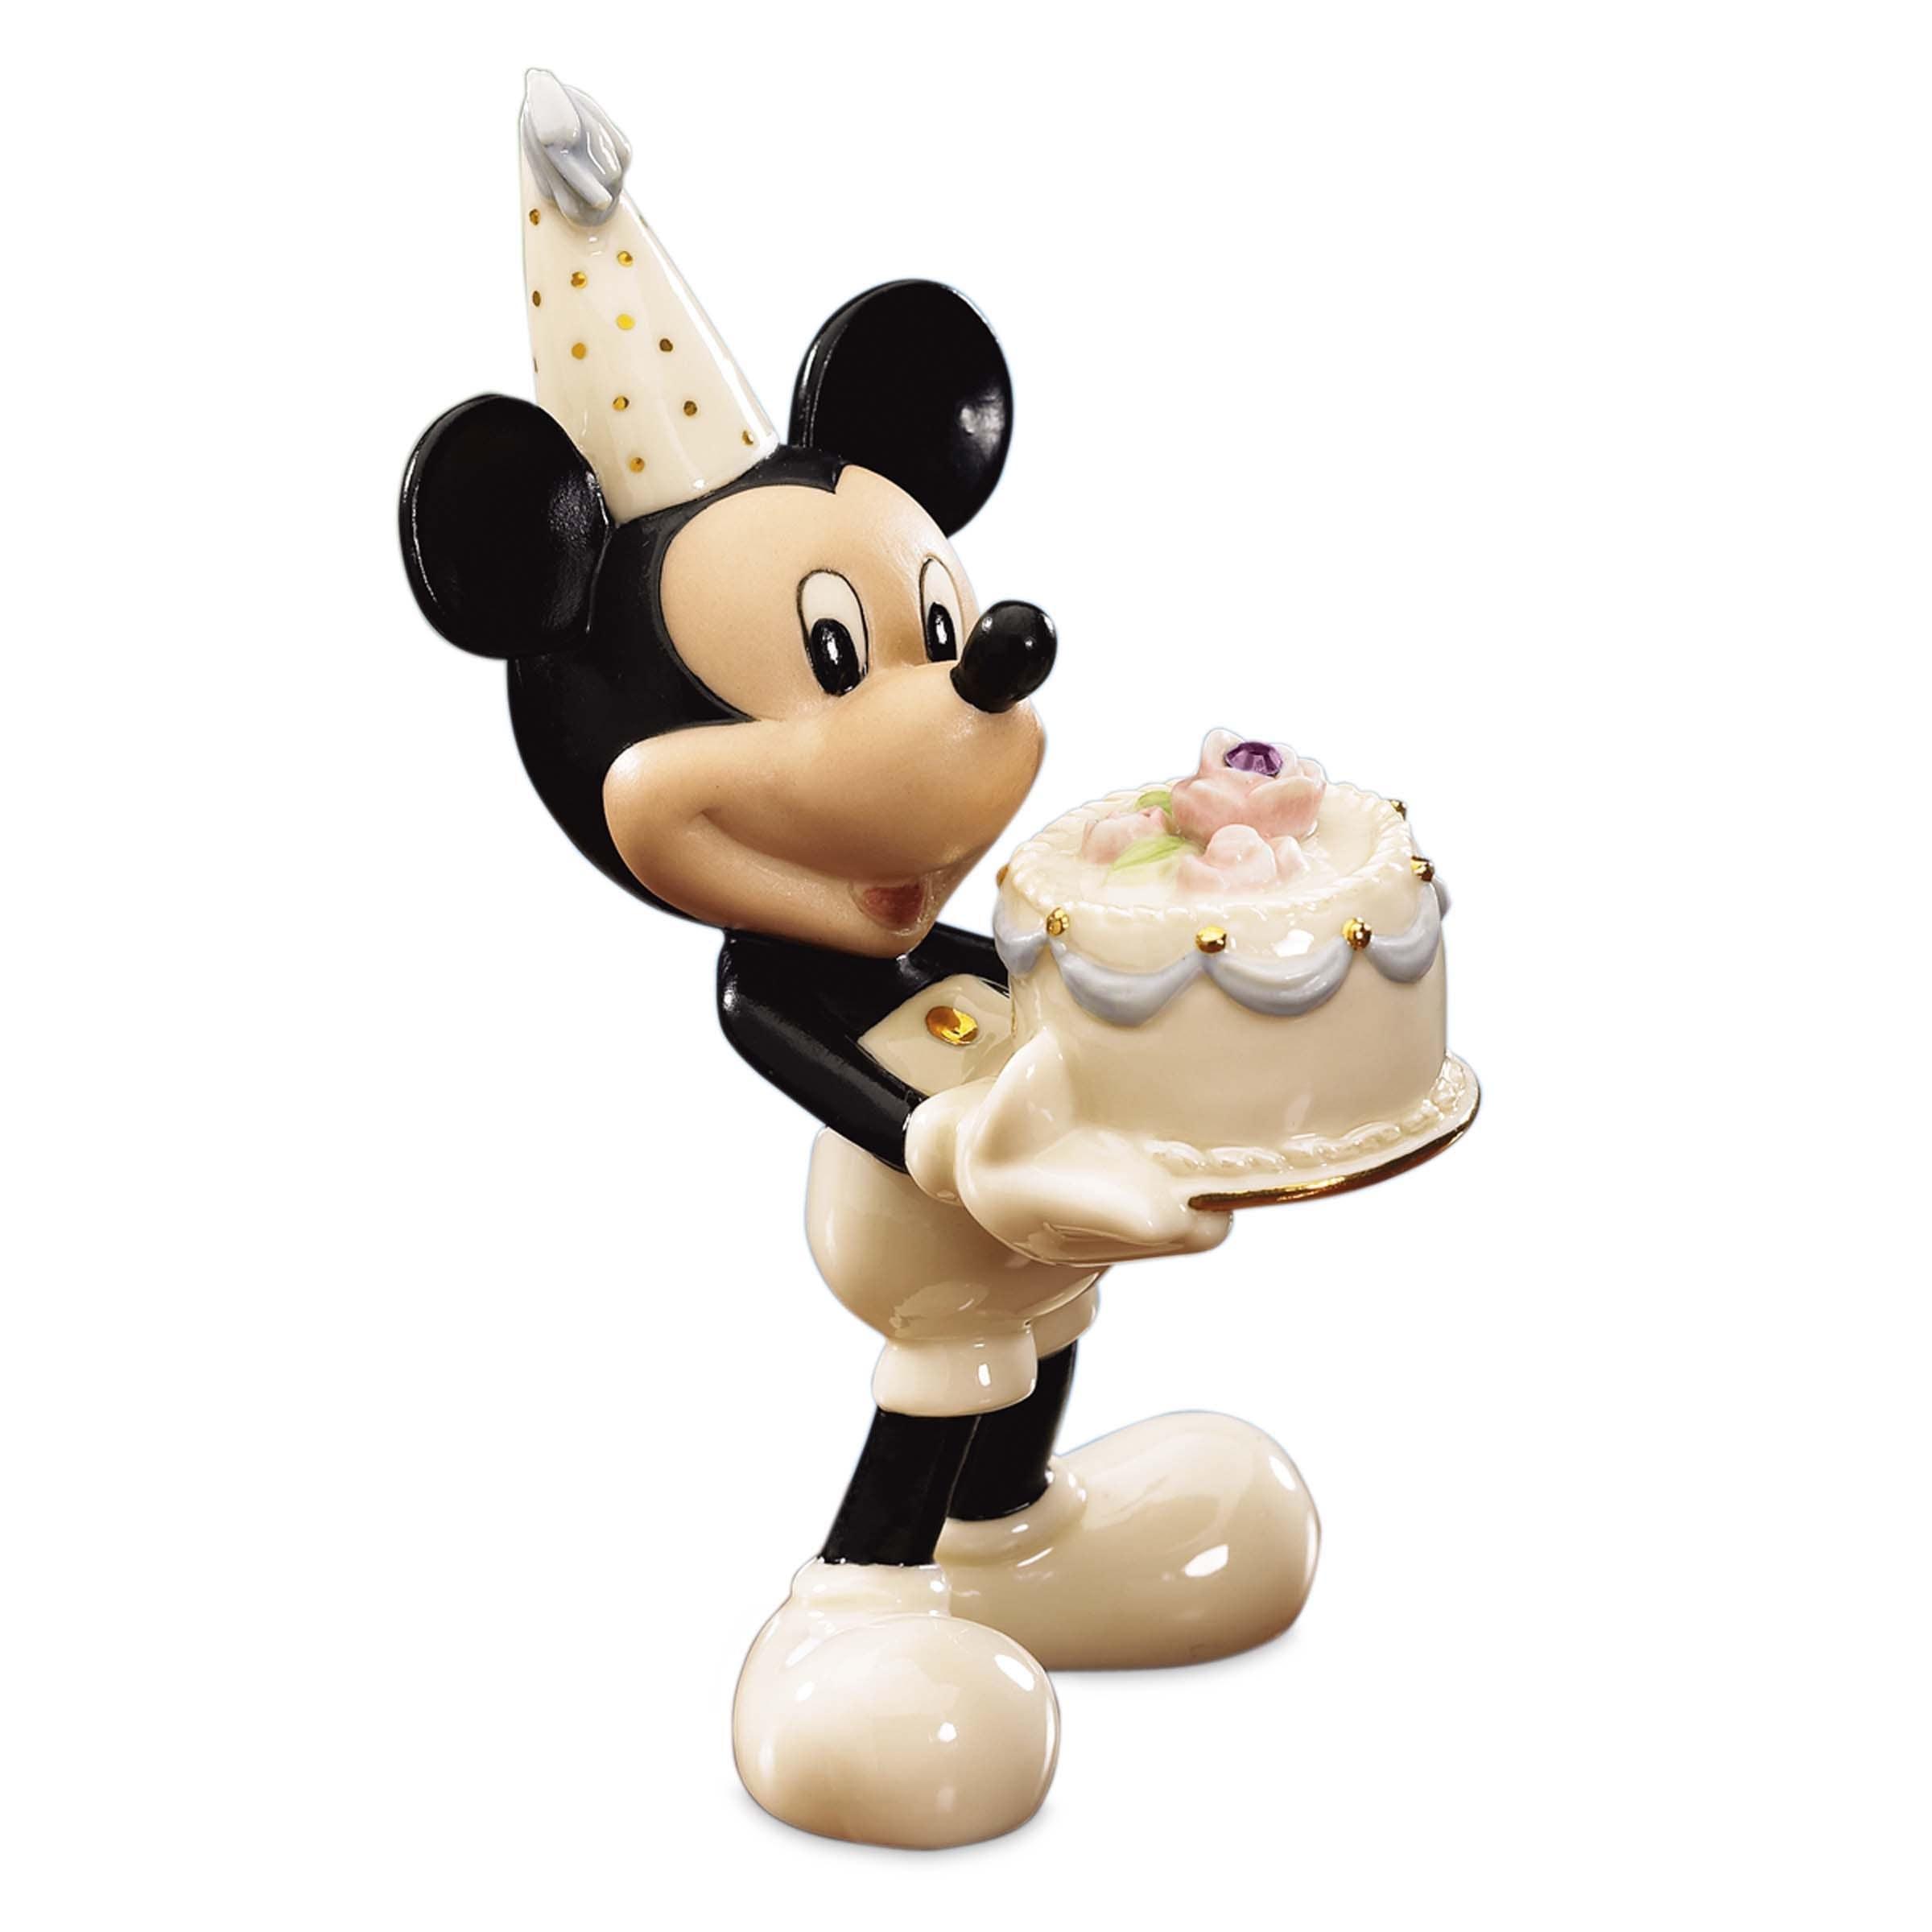 Lenox Disney 'Happy Birthday to You' Porcelain Mickey Mou...